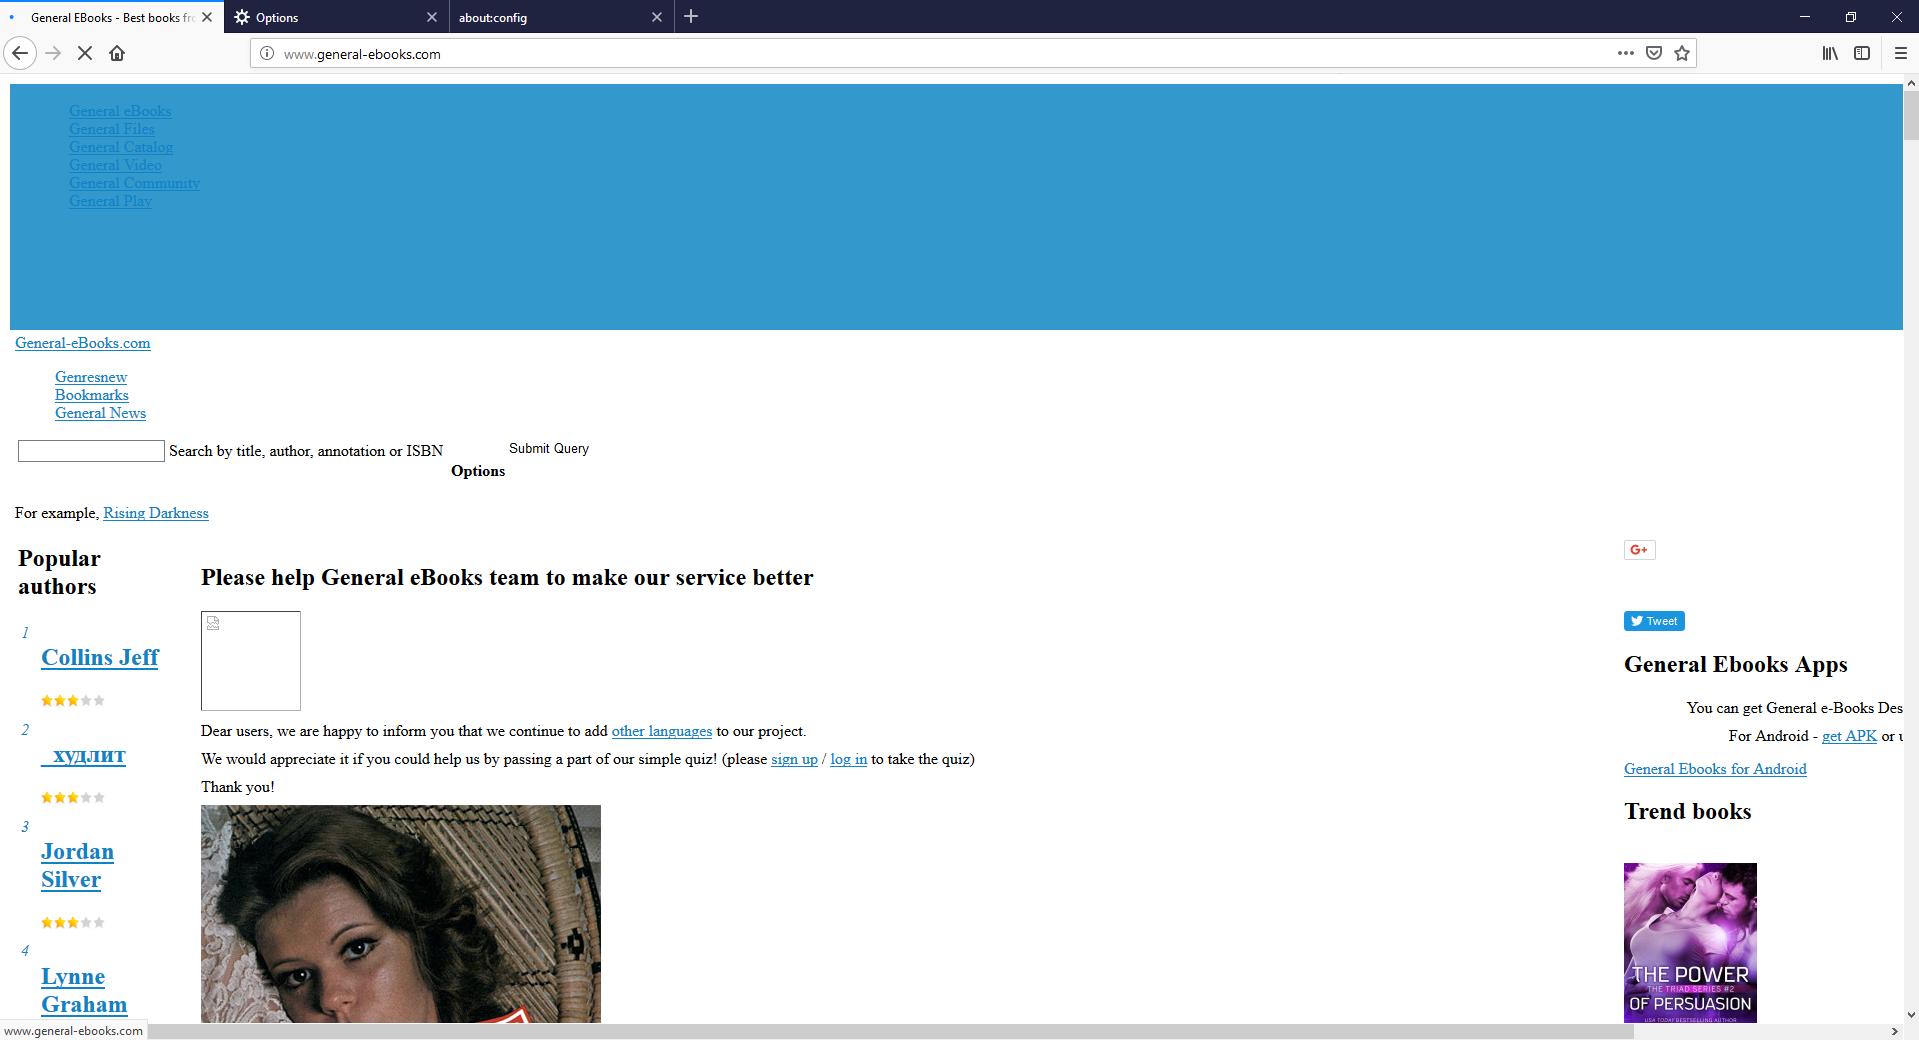 Www General Ebooks Com Design Is Broken Issue 18550 Webcompat